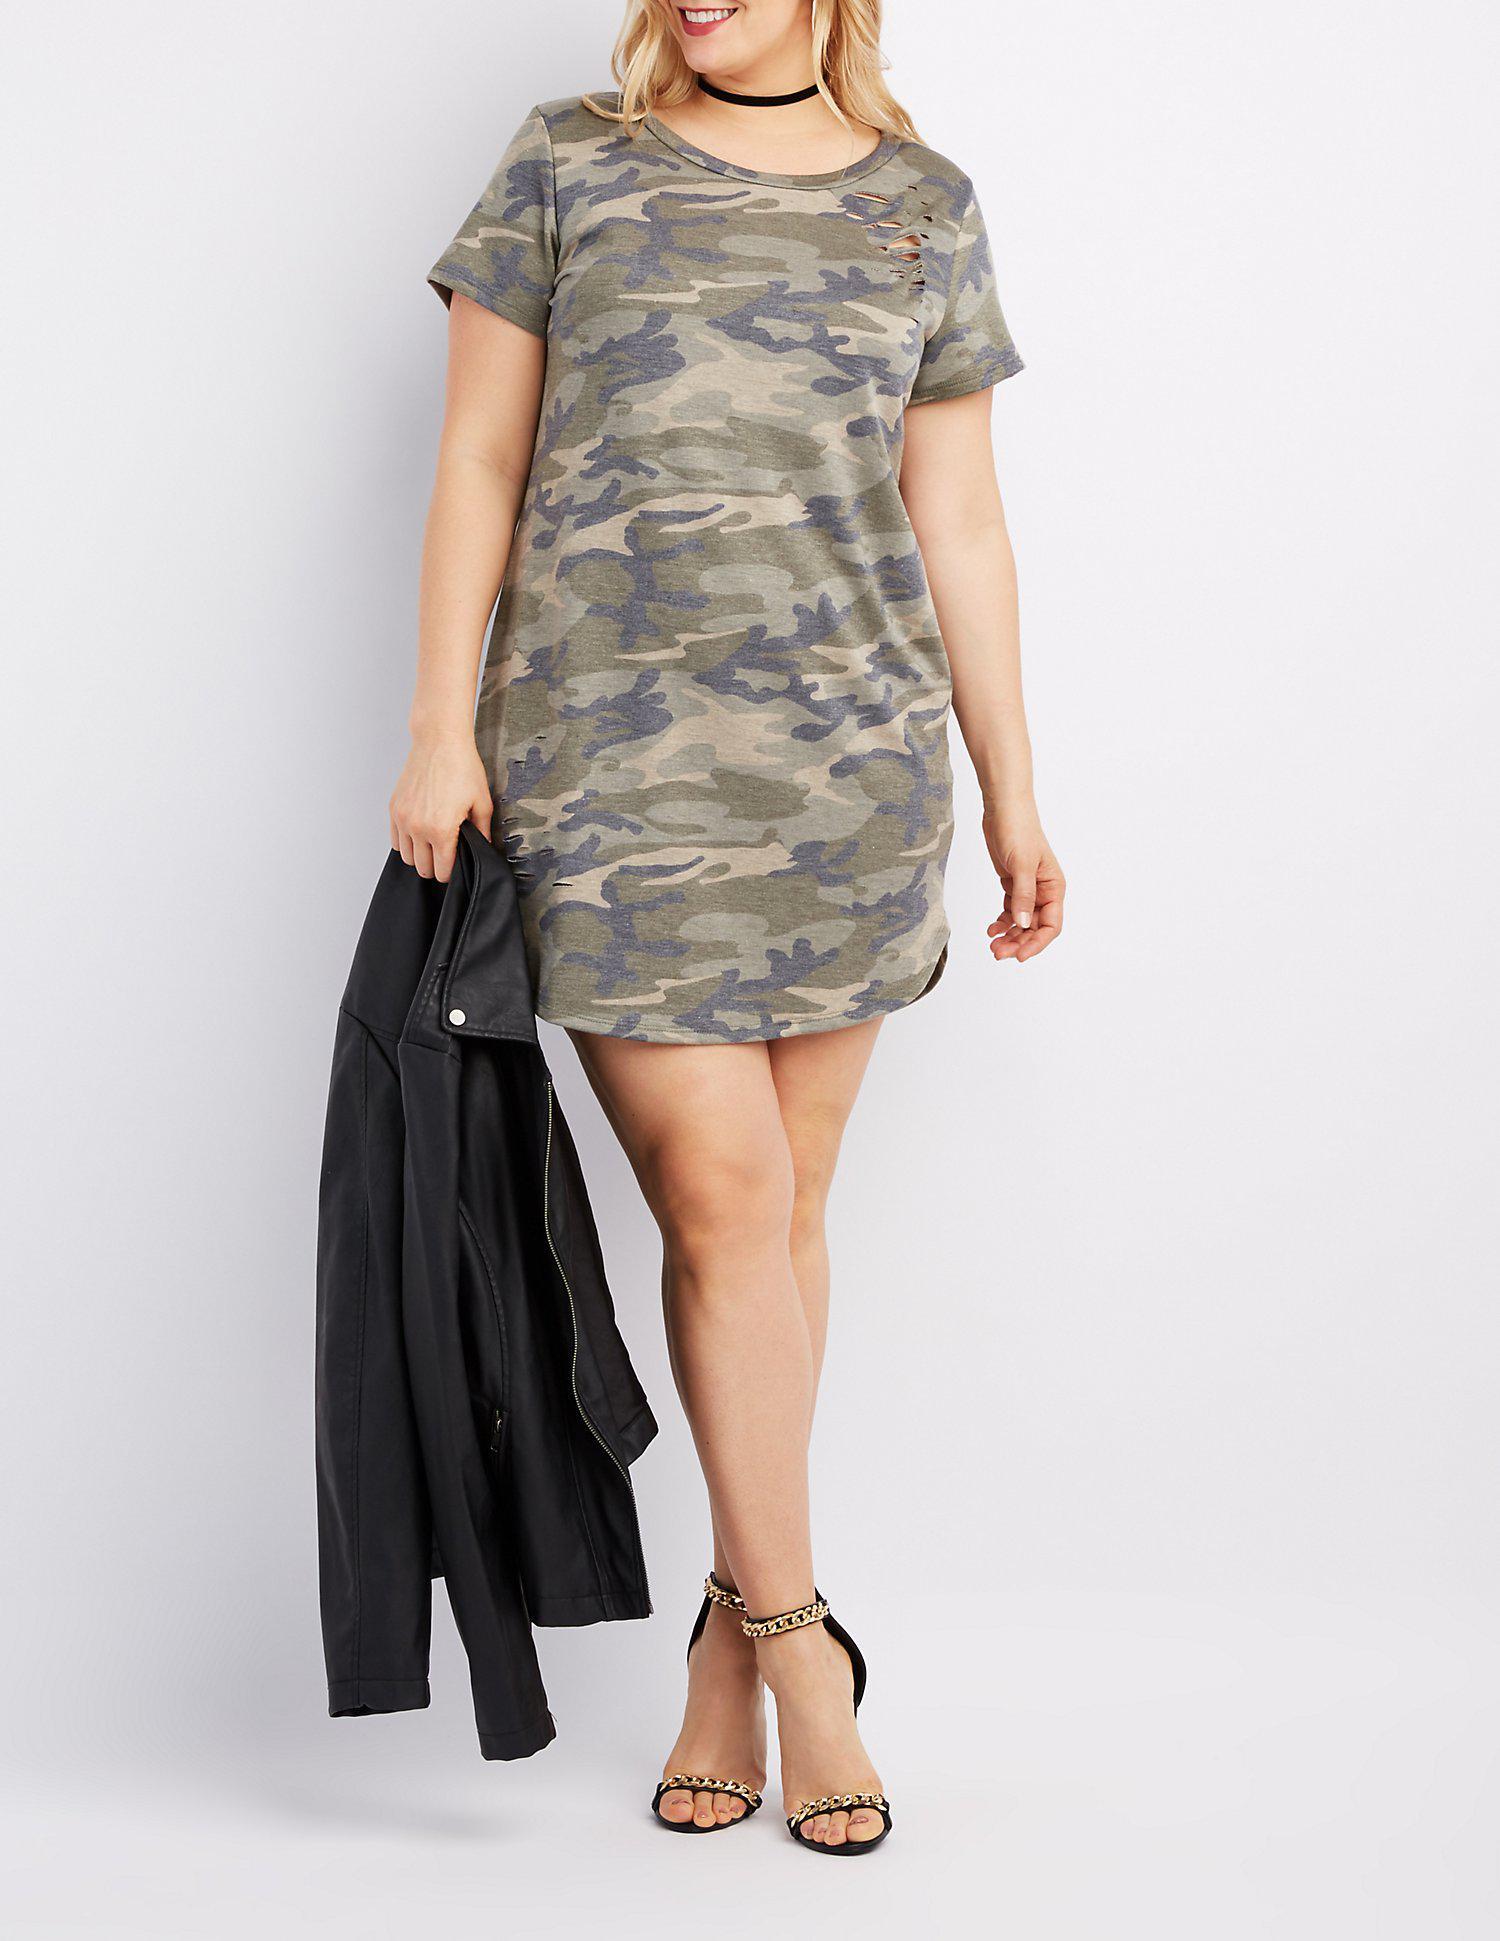 8540984c50b Lyst - Charlotte Russe Plus Size Camo Destroyed T-shirt Dress